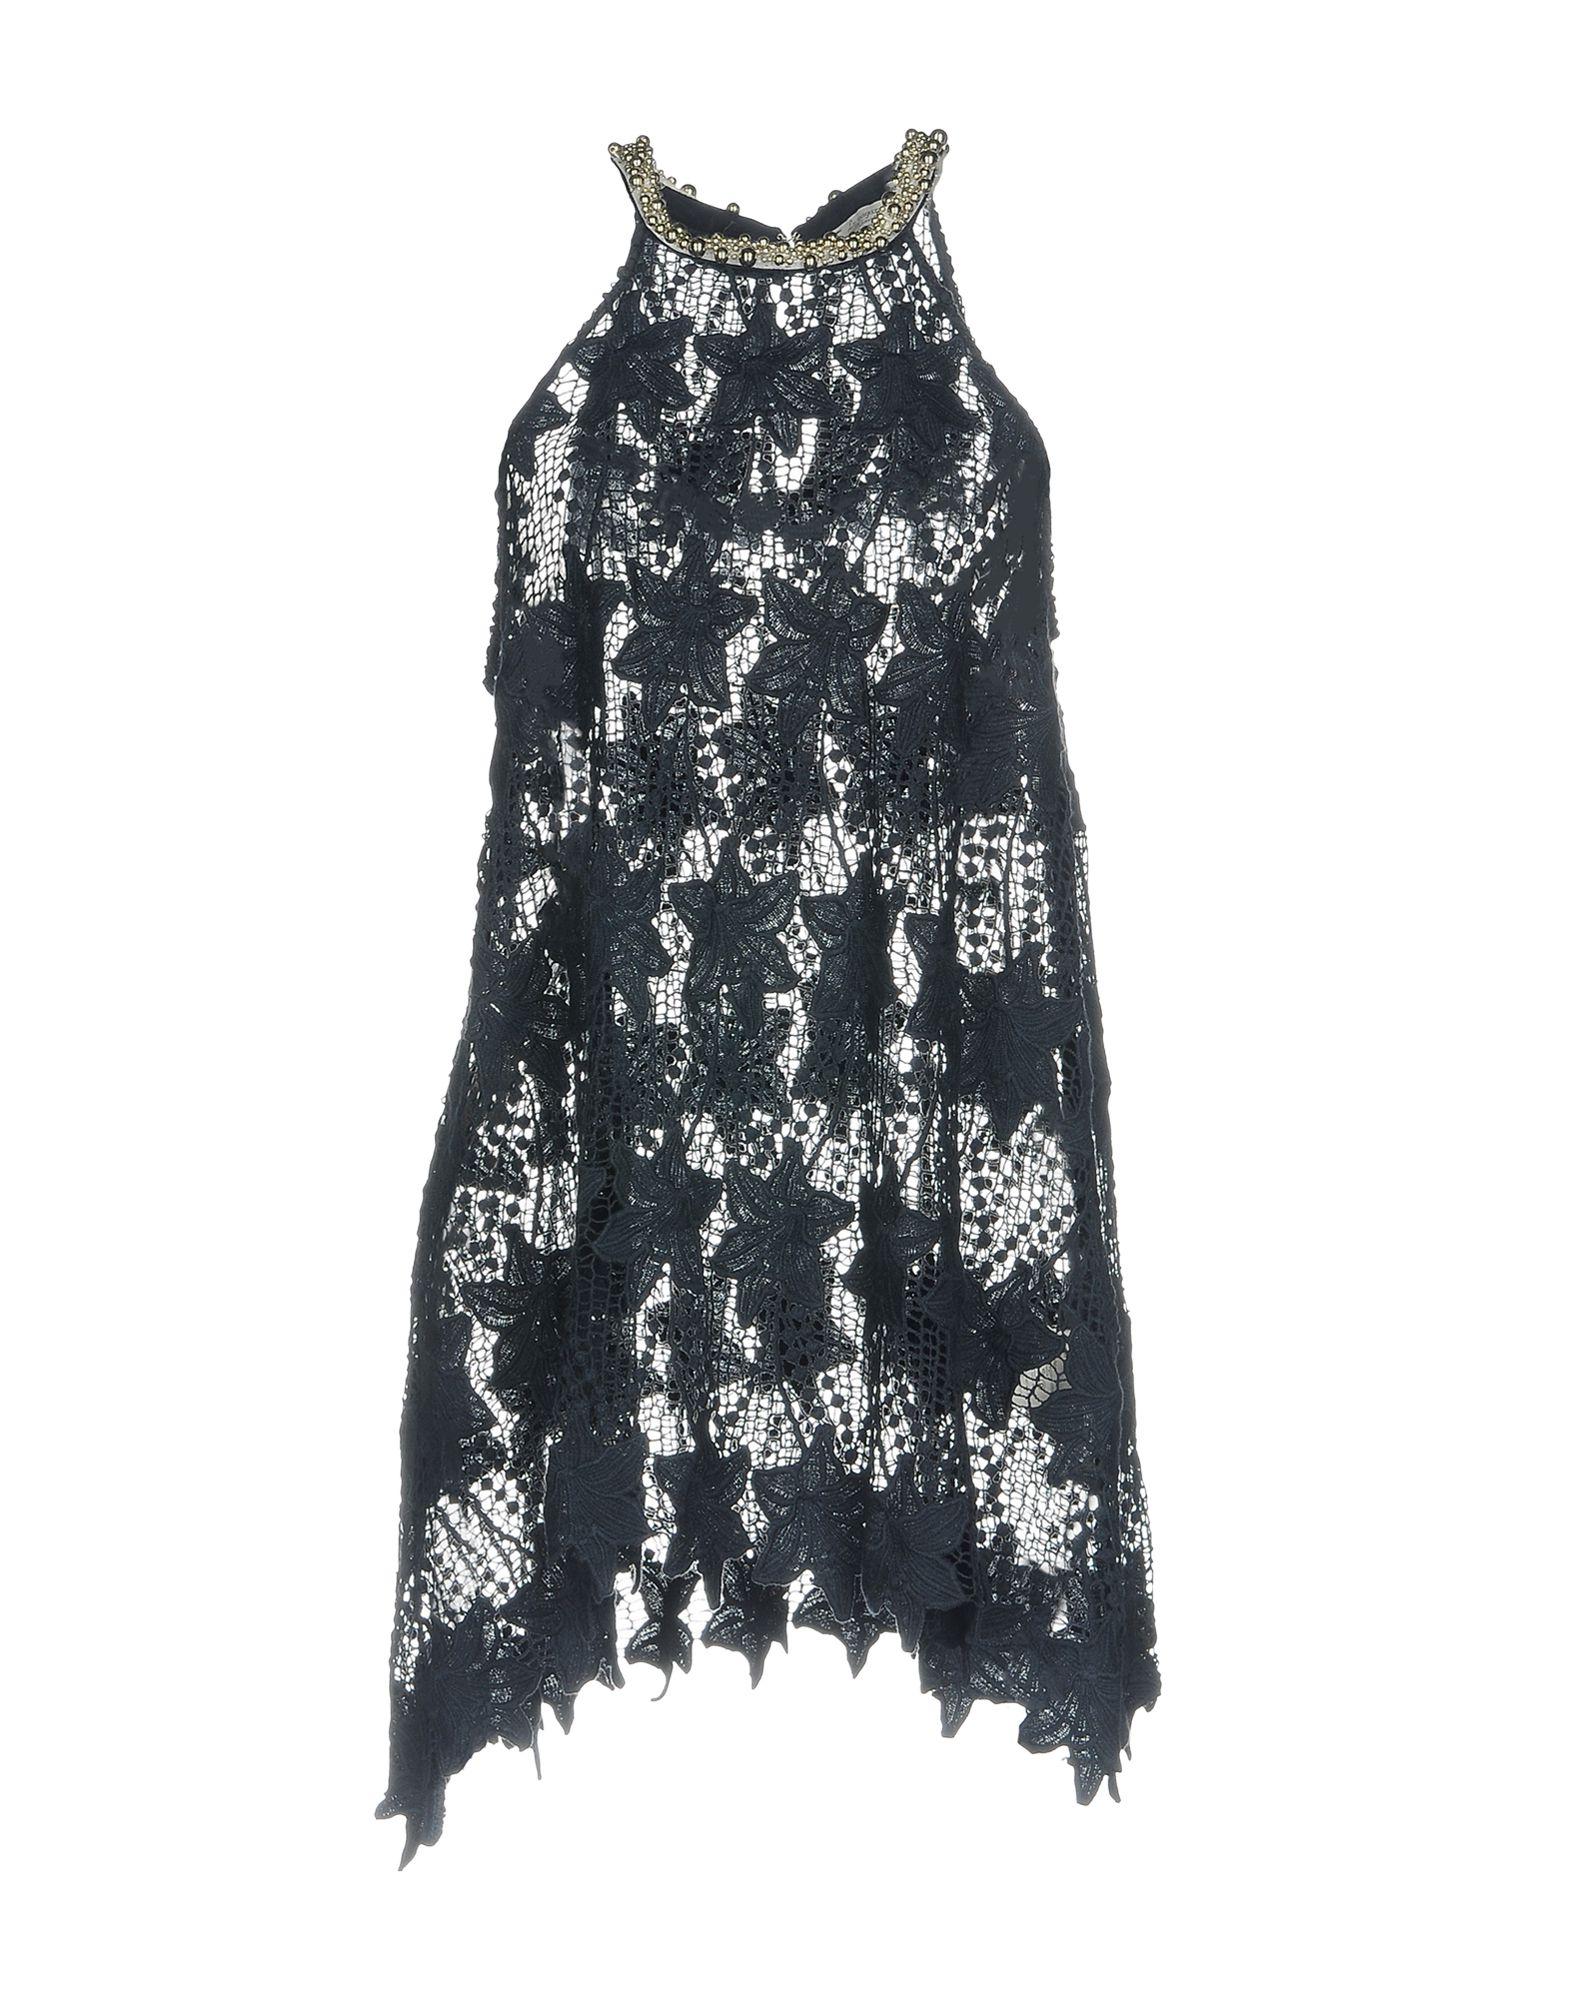 LE RAGAZZE DI ST. BARTH Короткое платье le ragazze di st barth мини юбка